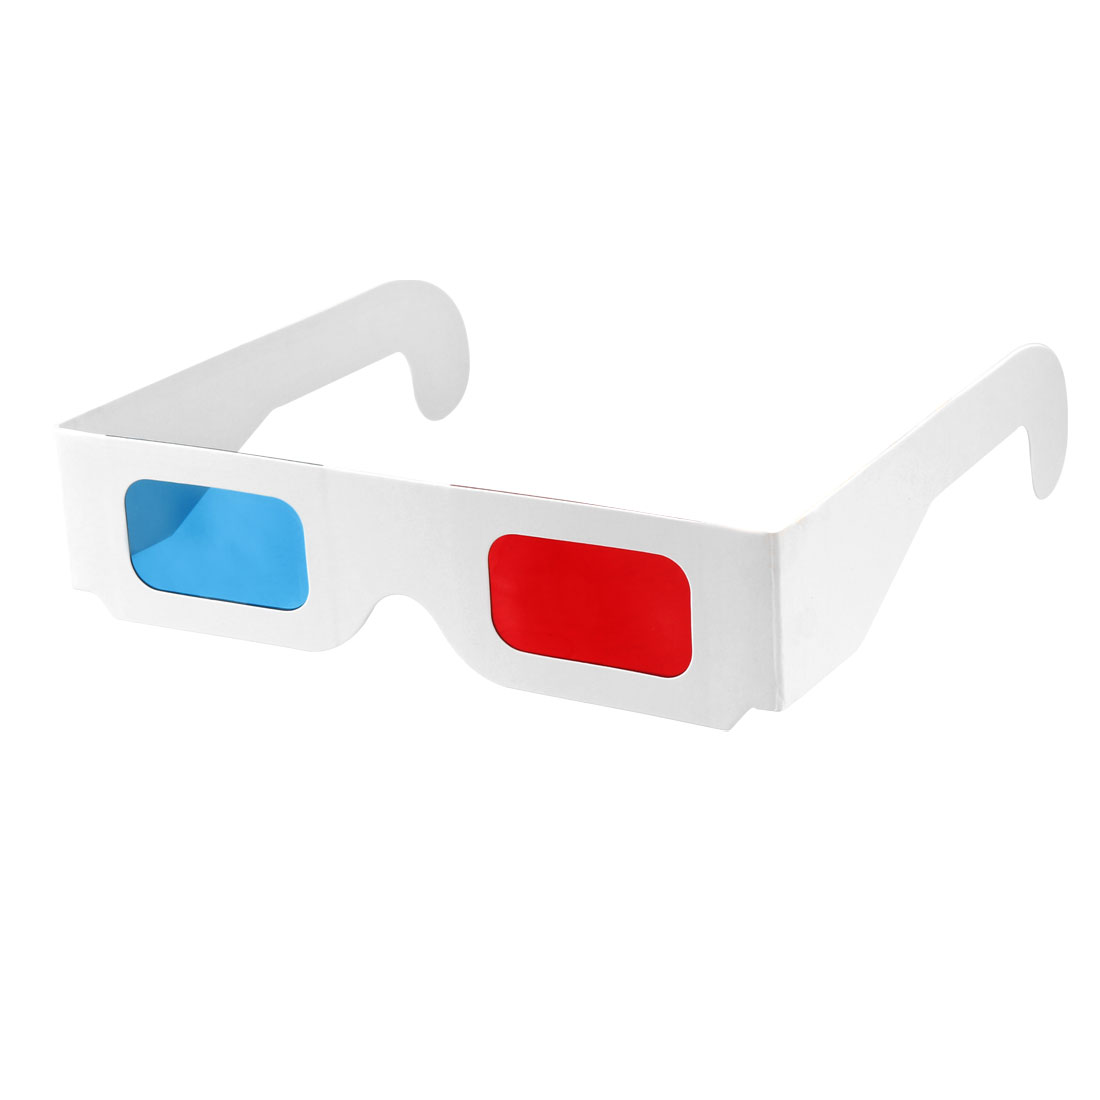 Red-Blue Cardboard Glasses WHITE Frame 3D Paper Glasses Anaglyph Cardboard 10pcs